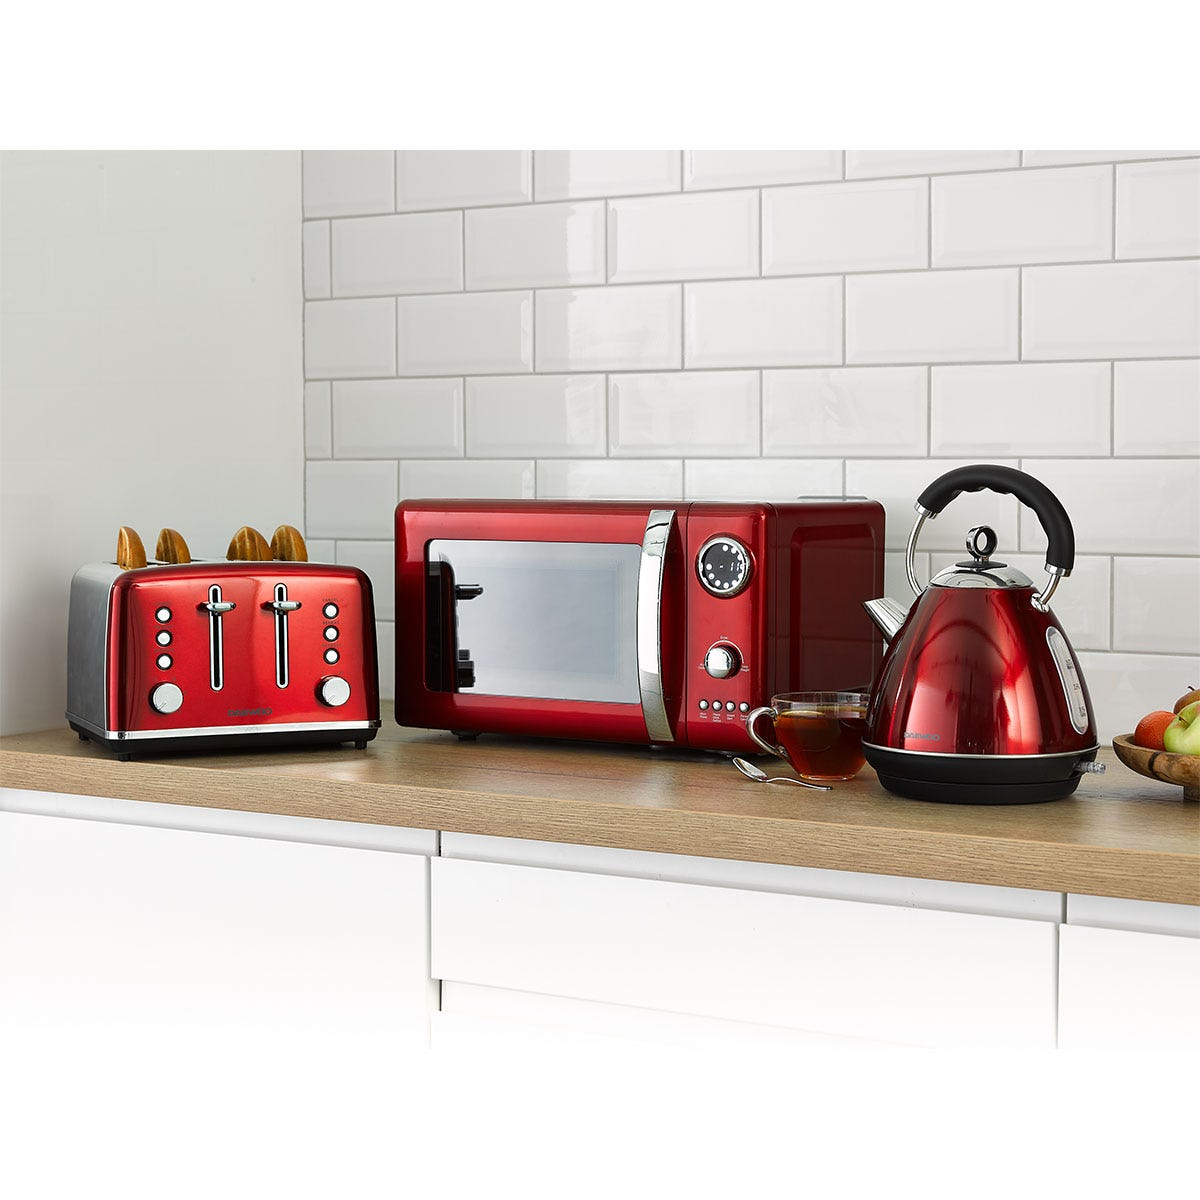 Daewoo SDA2527DS Kensington 1.7L Pyramid Kettle, 4-Slice Toaster, and 20L Digital Microwave Bundle - Red